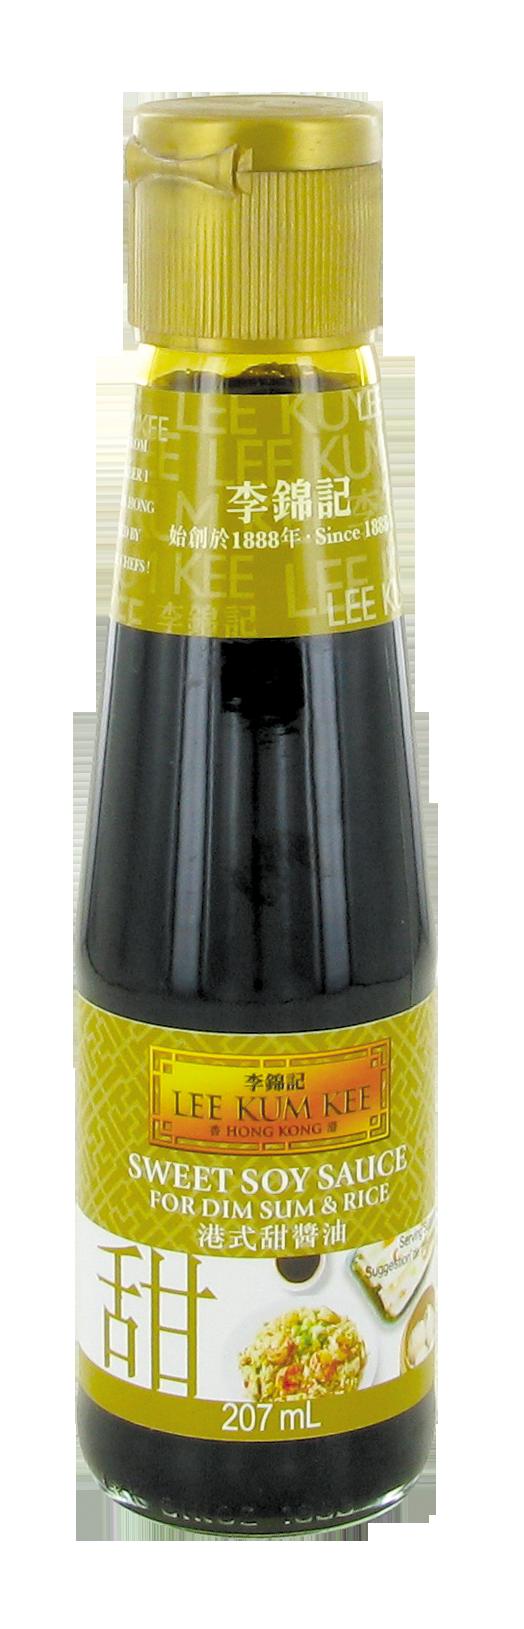 Sauce soja sucrée pour dim, sum & riz, Lee kum kee (207 ml)